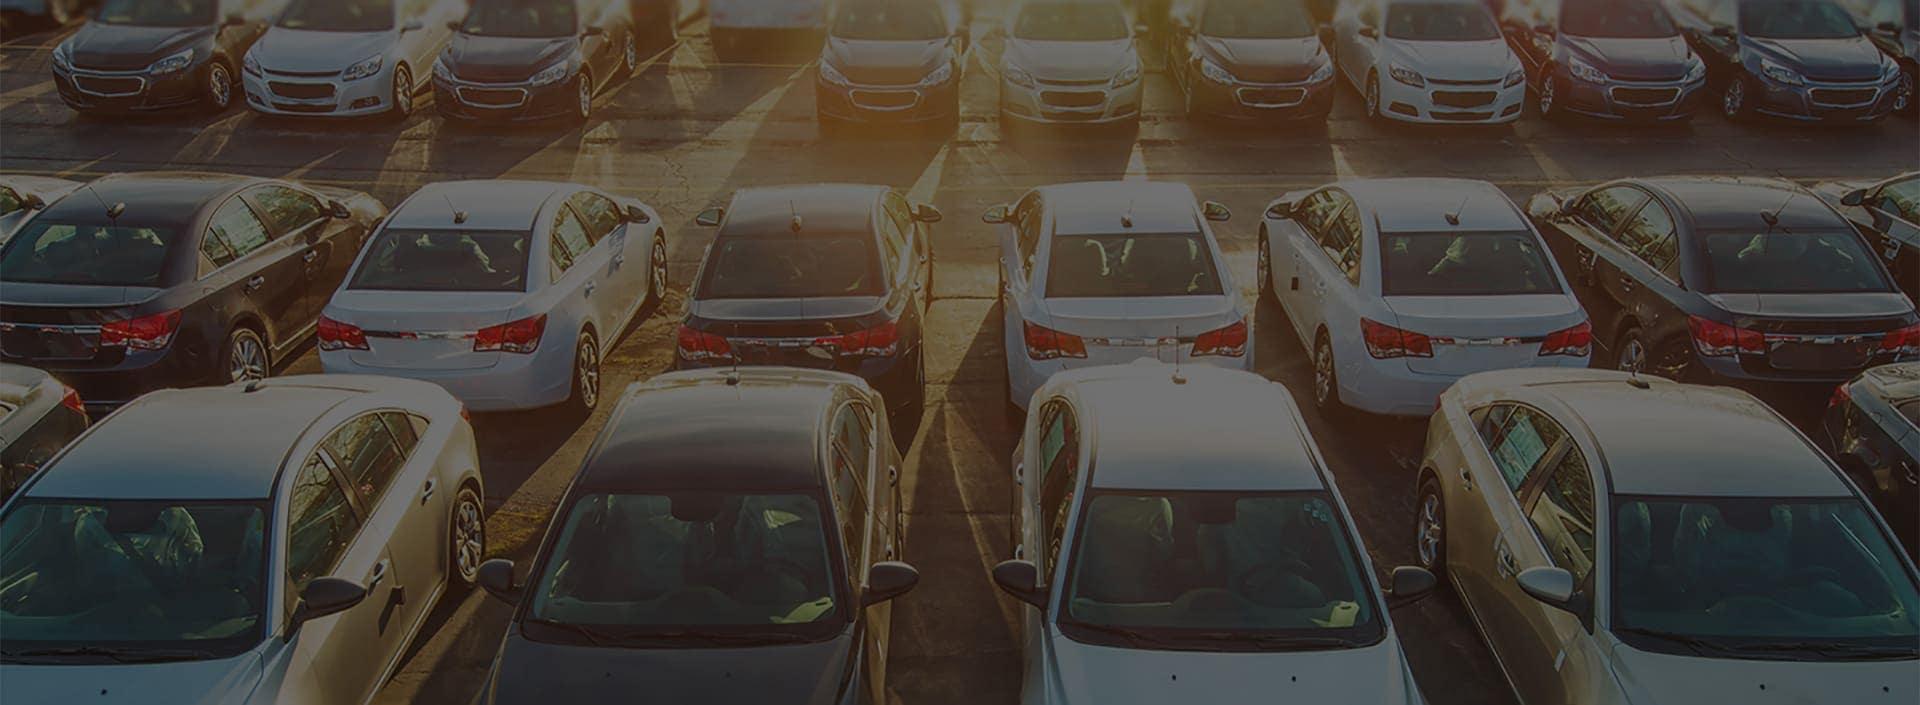 Welcome to Ryan Motors